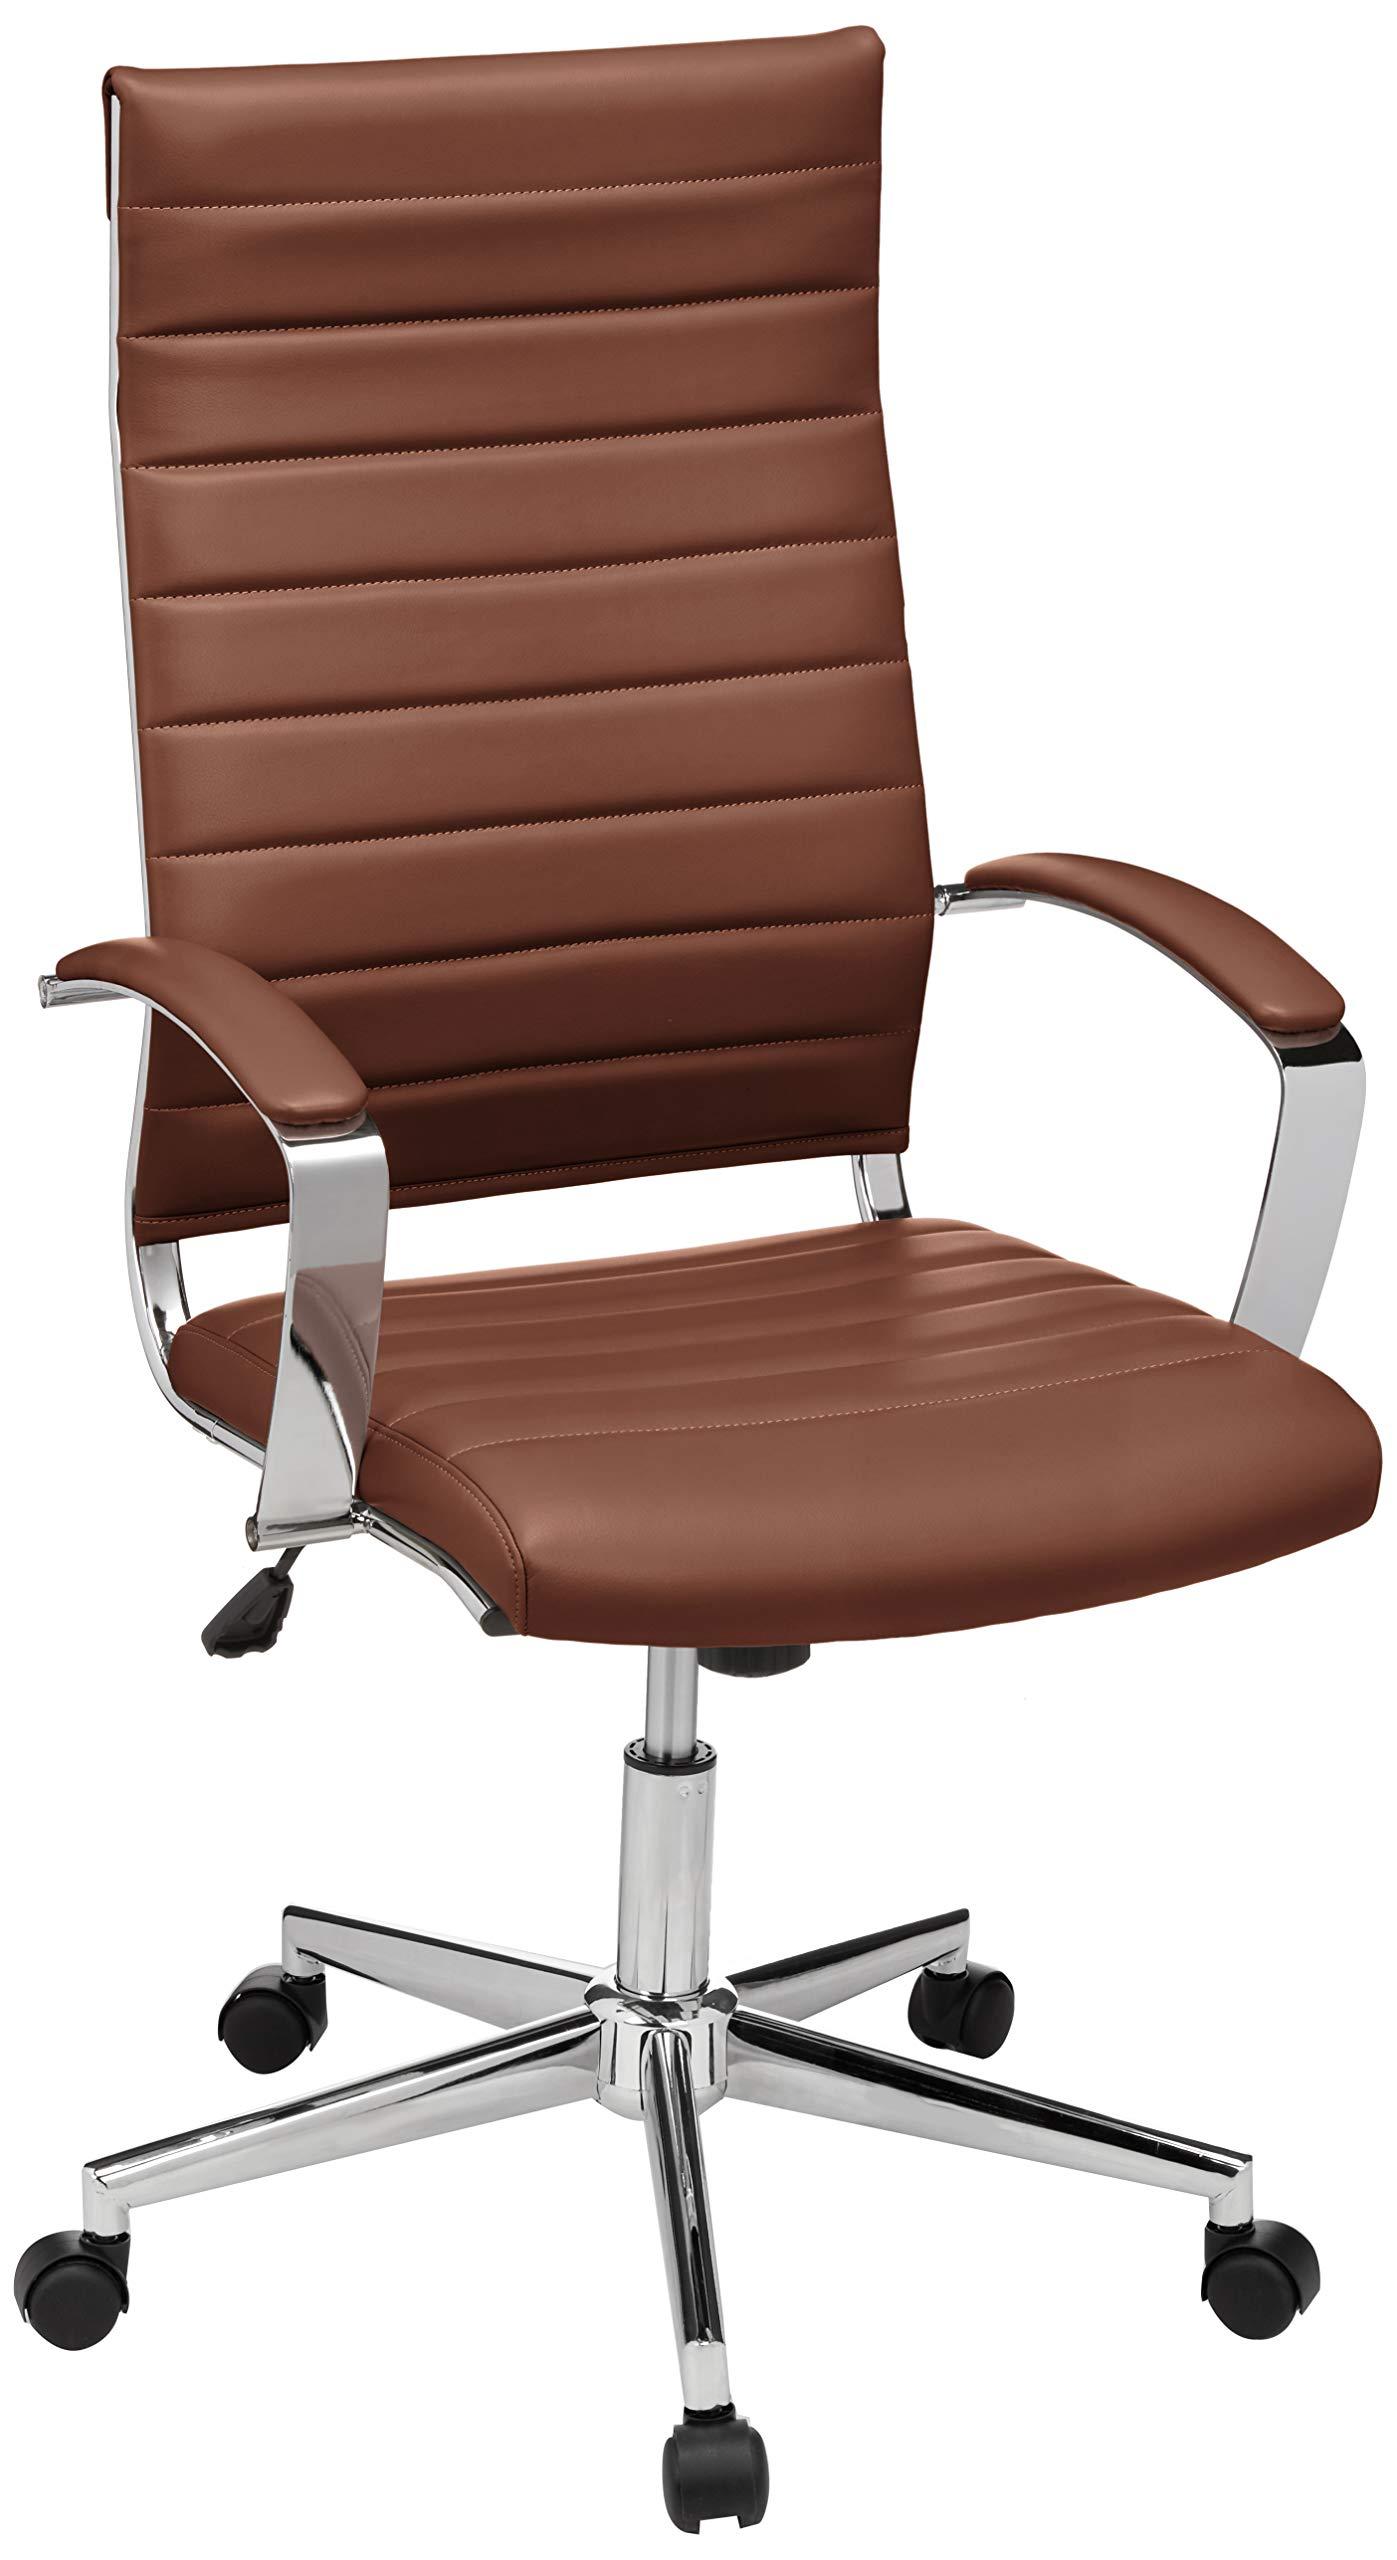 AmazonBasics High-Back Executive Swivel Office Desk Chair with Ribbed Puresoft Upholstery - Brick Red by AmazonBasics